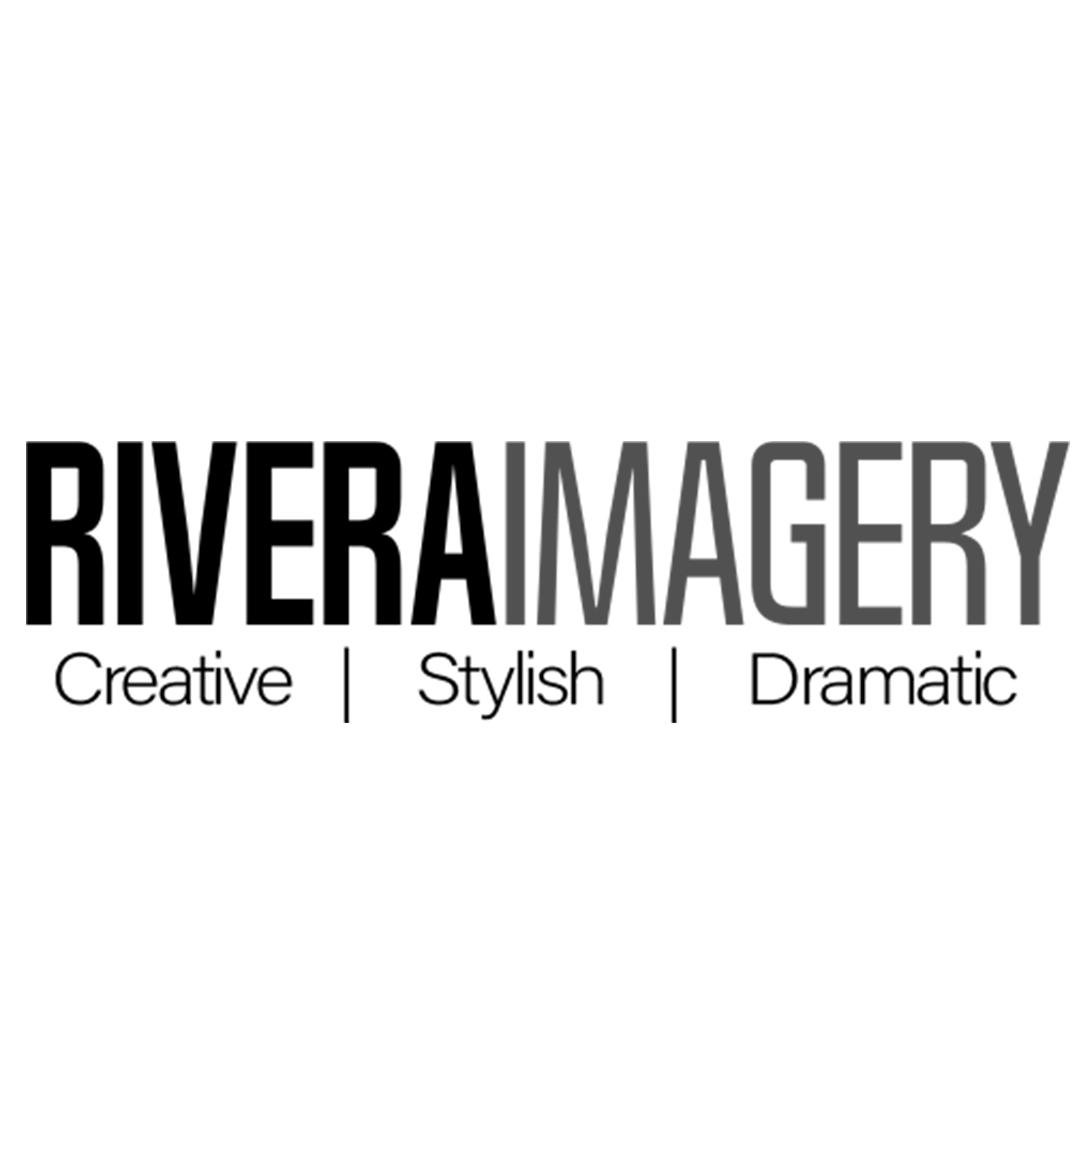 Rivera Imagery floor plan in Hemet Menifee Moreno Valley Murrieta Perris Redlands Riverside Temecula Winchester